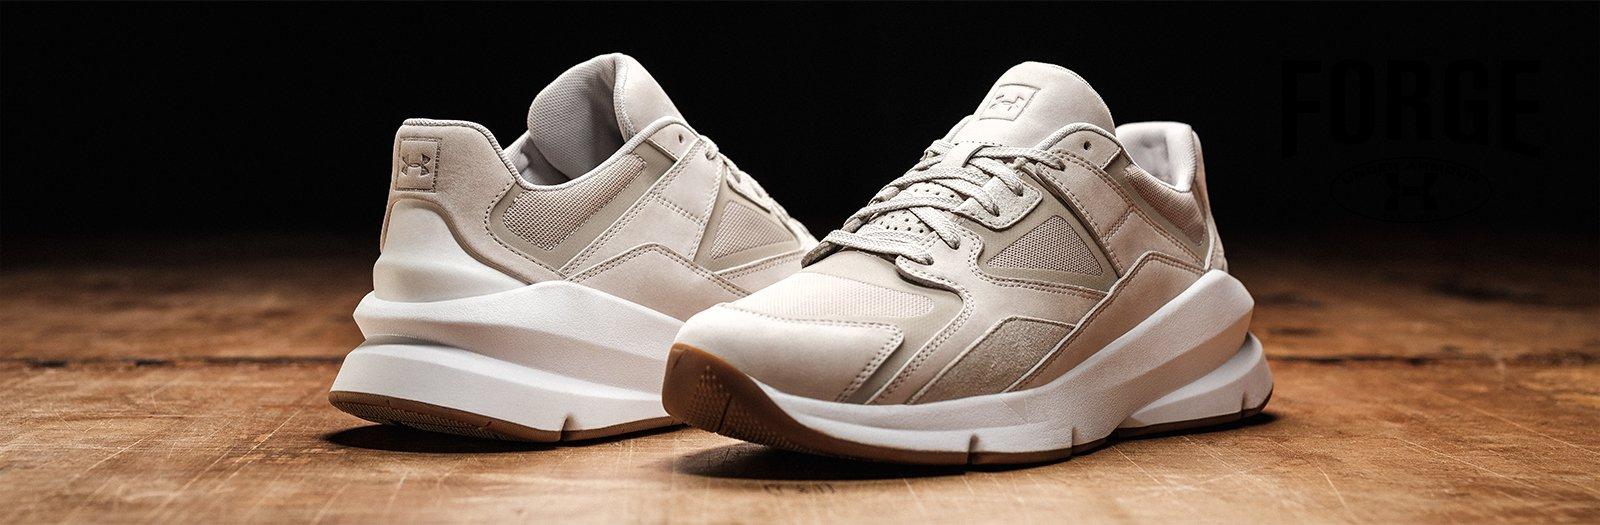 Mengalirkan Udara Dengan Maksimal. Teknologi Terkini. Sepatu yang  terinsipirasi dari tahun 1996 - tahun di mana pertama kalinya Under Armour  diciptakan.